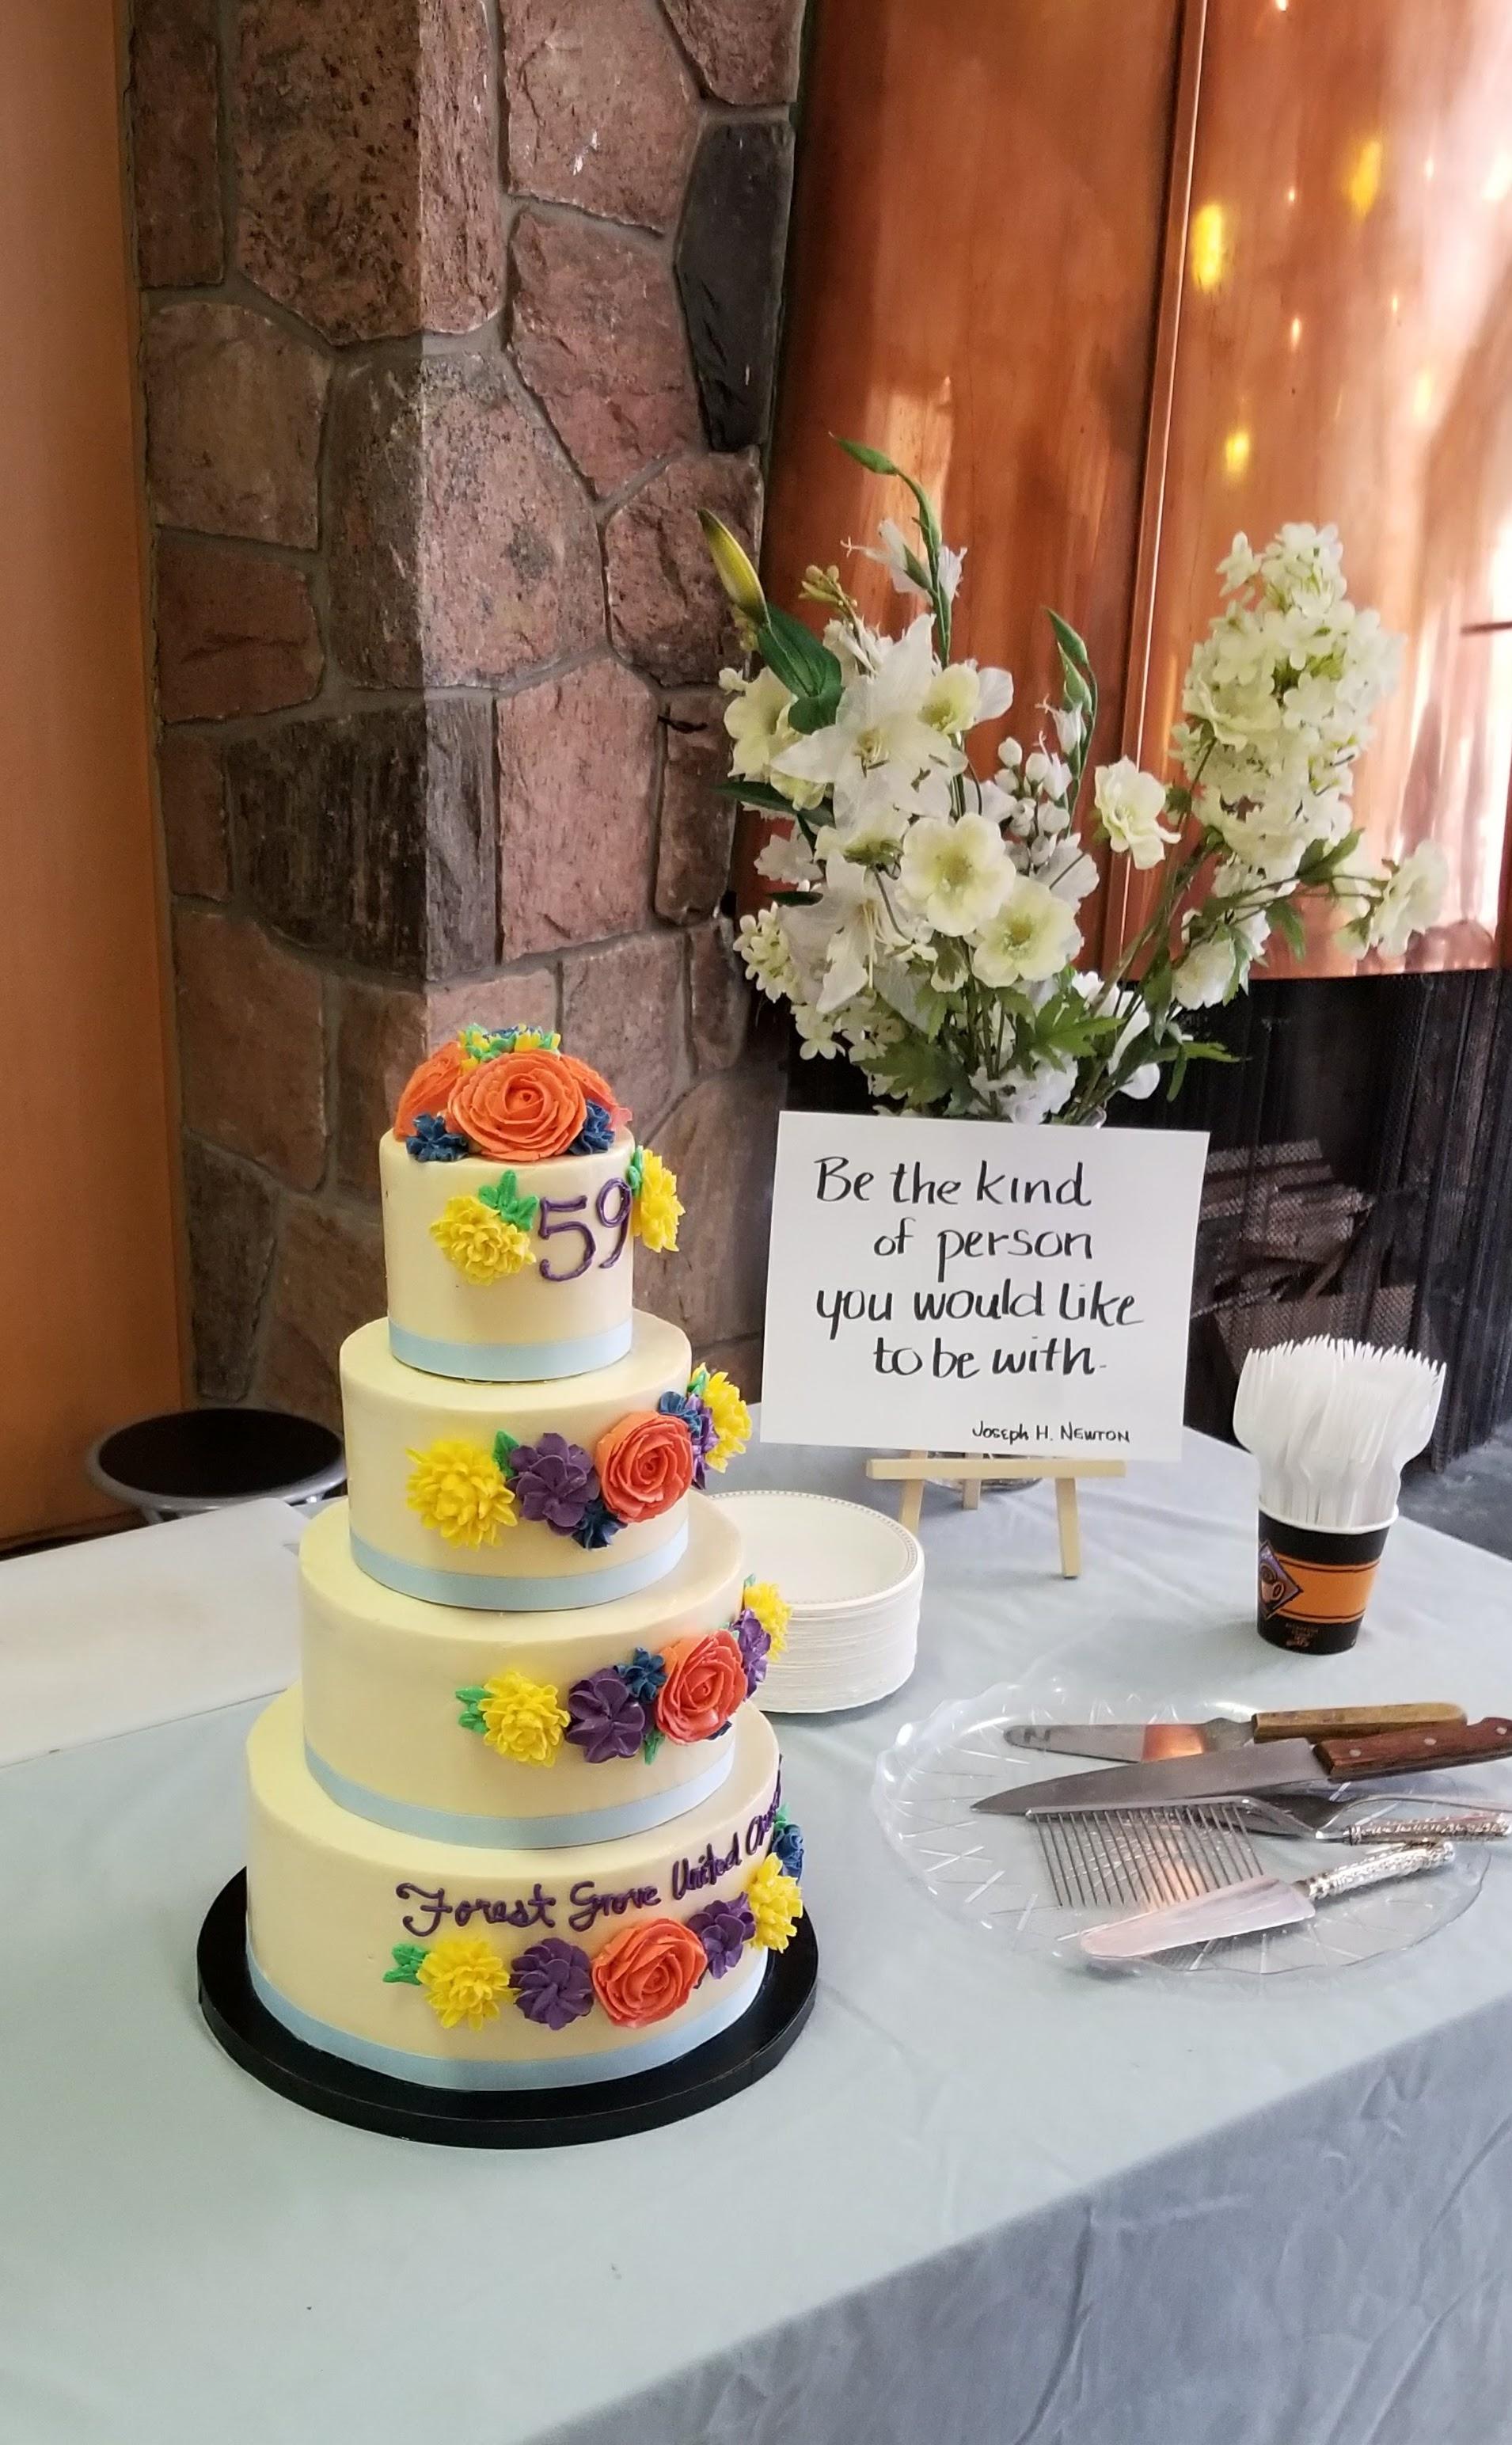 The Cake, by Gladycakes (aka FGUC Administrator)